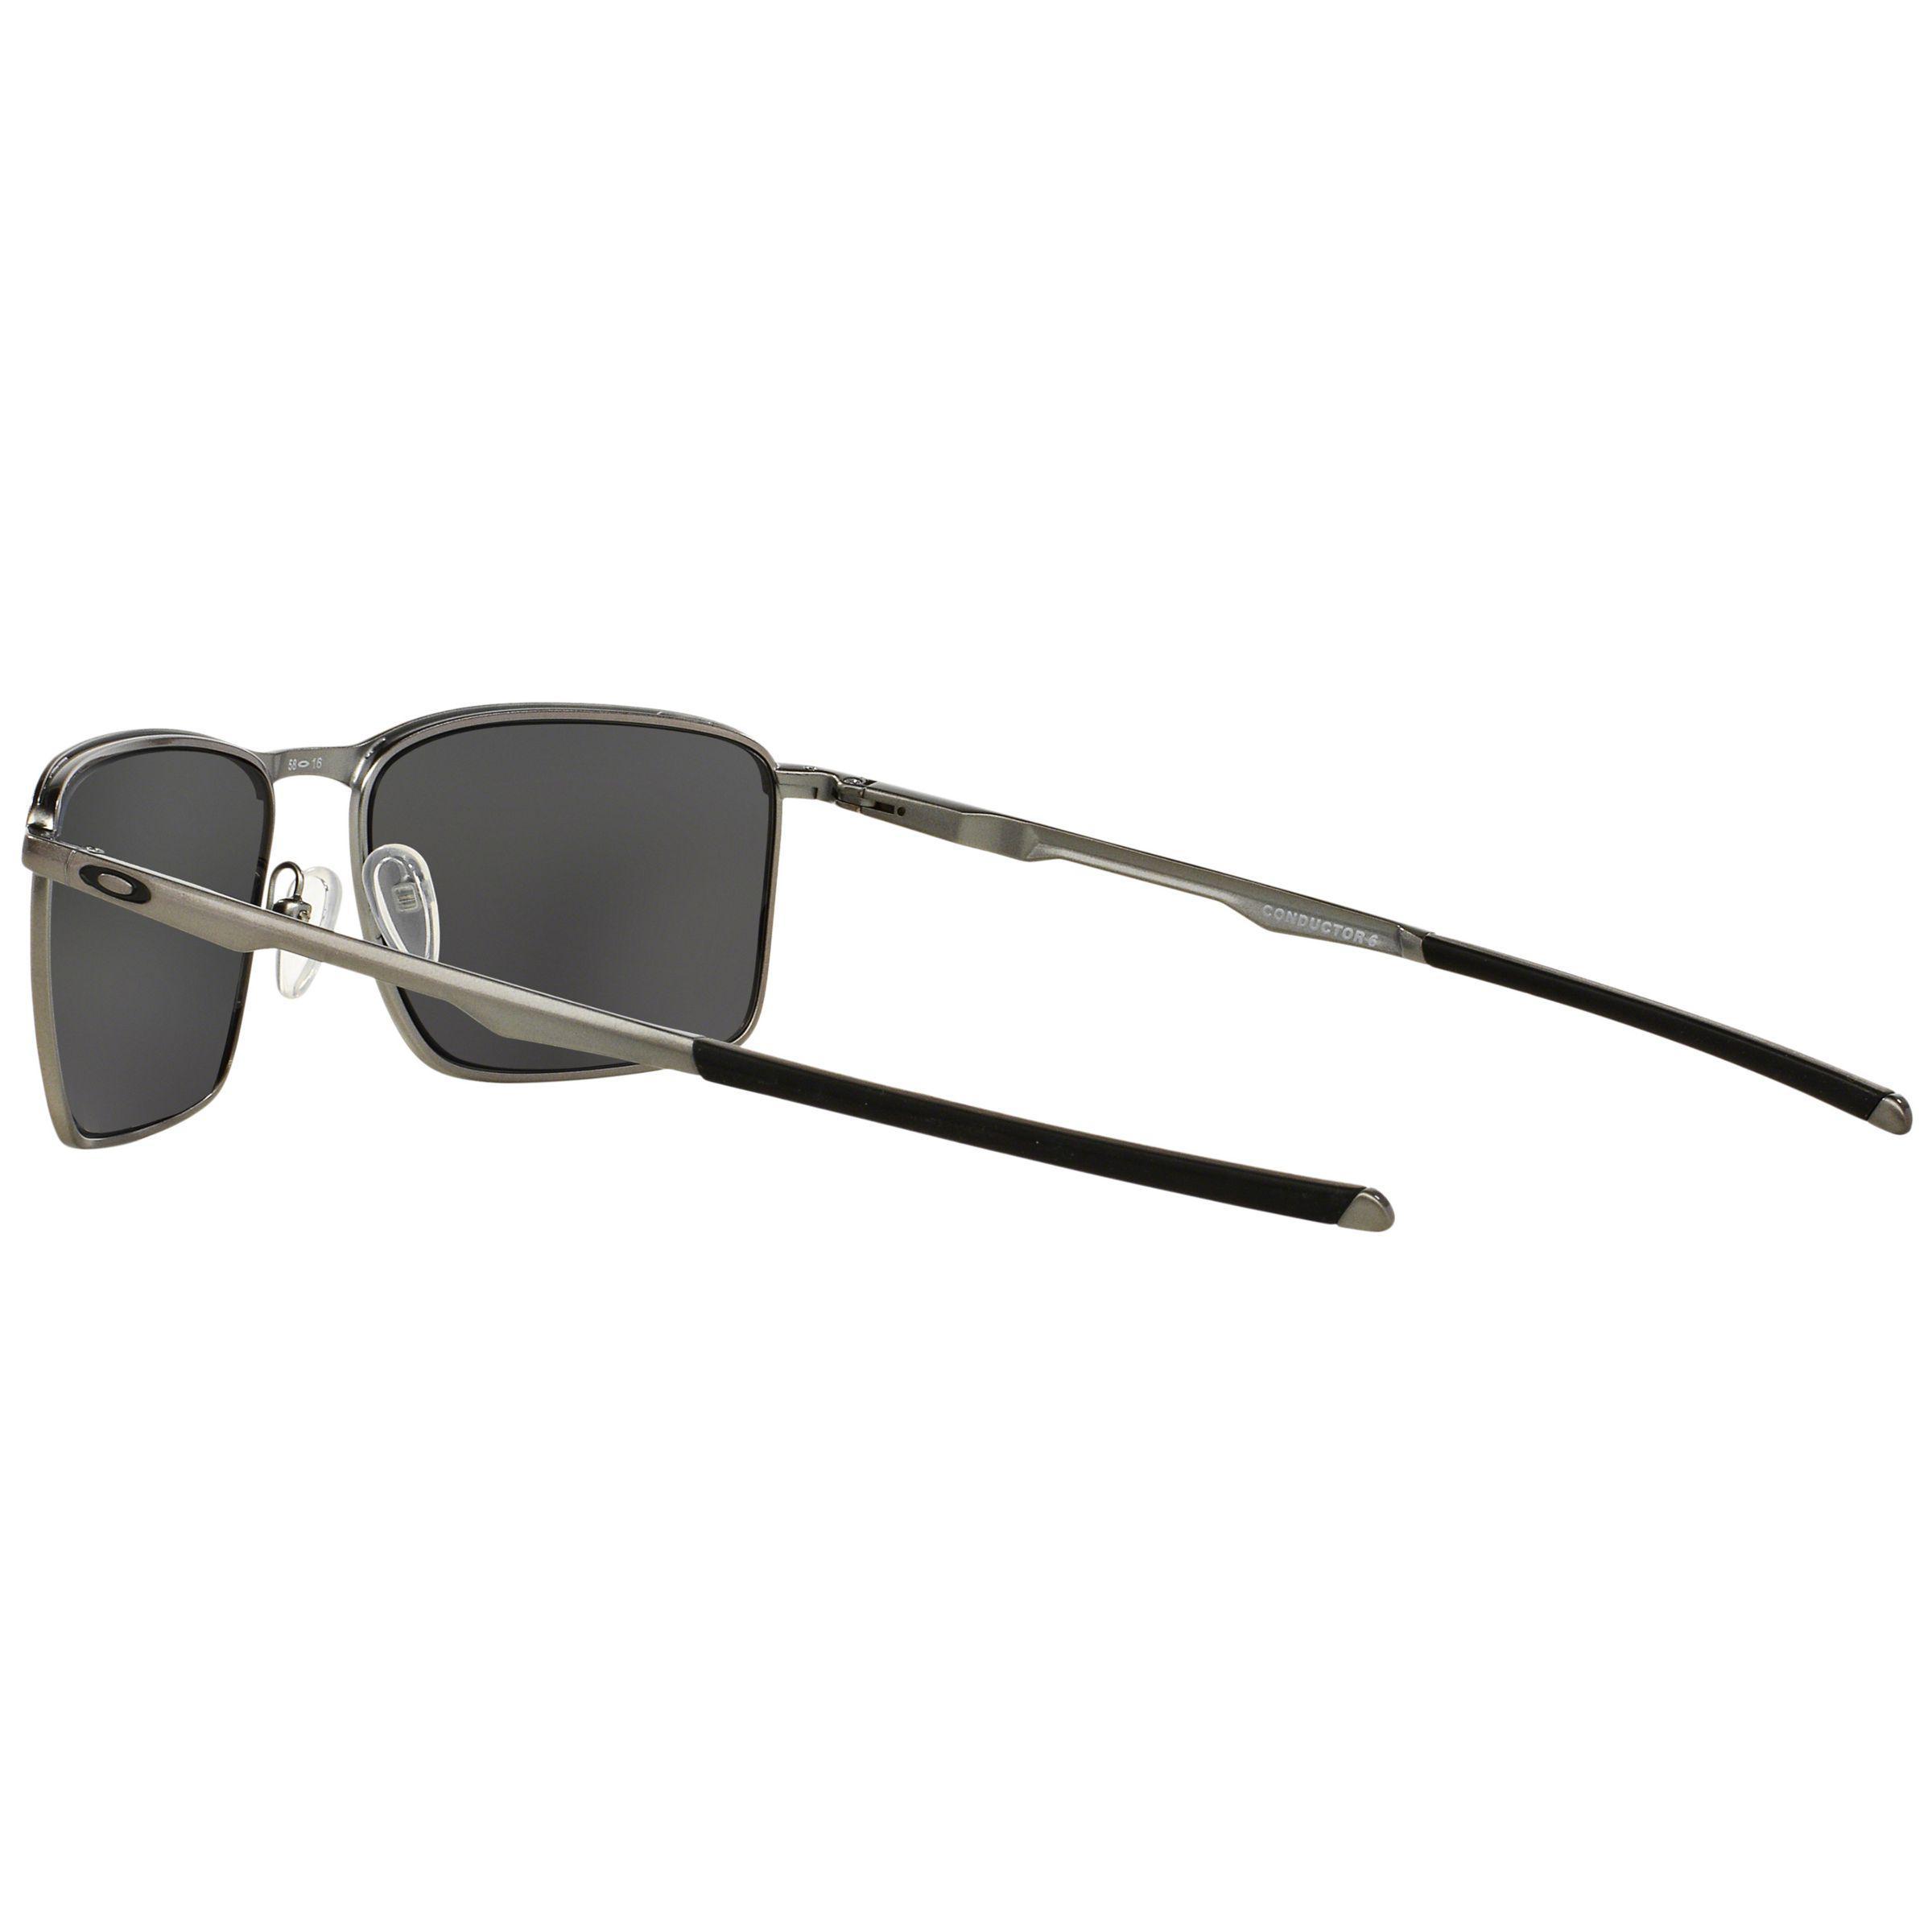 Oakley Oo4106 Conductor 6 Polarised Rectangular Sunglasses in Black for Men